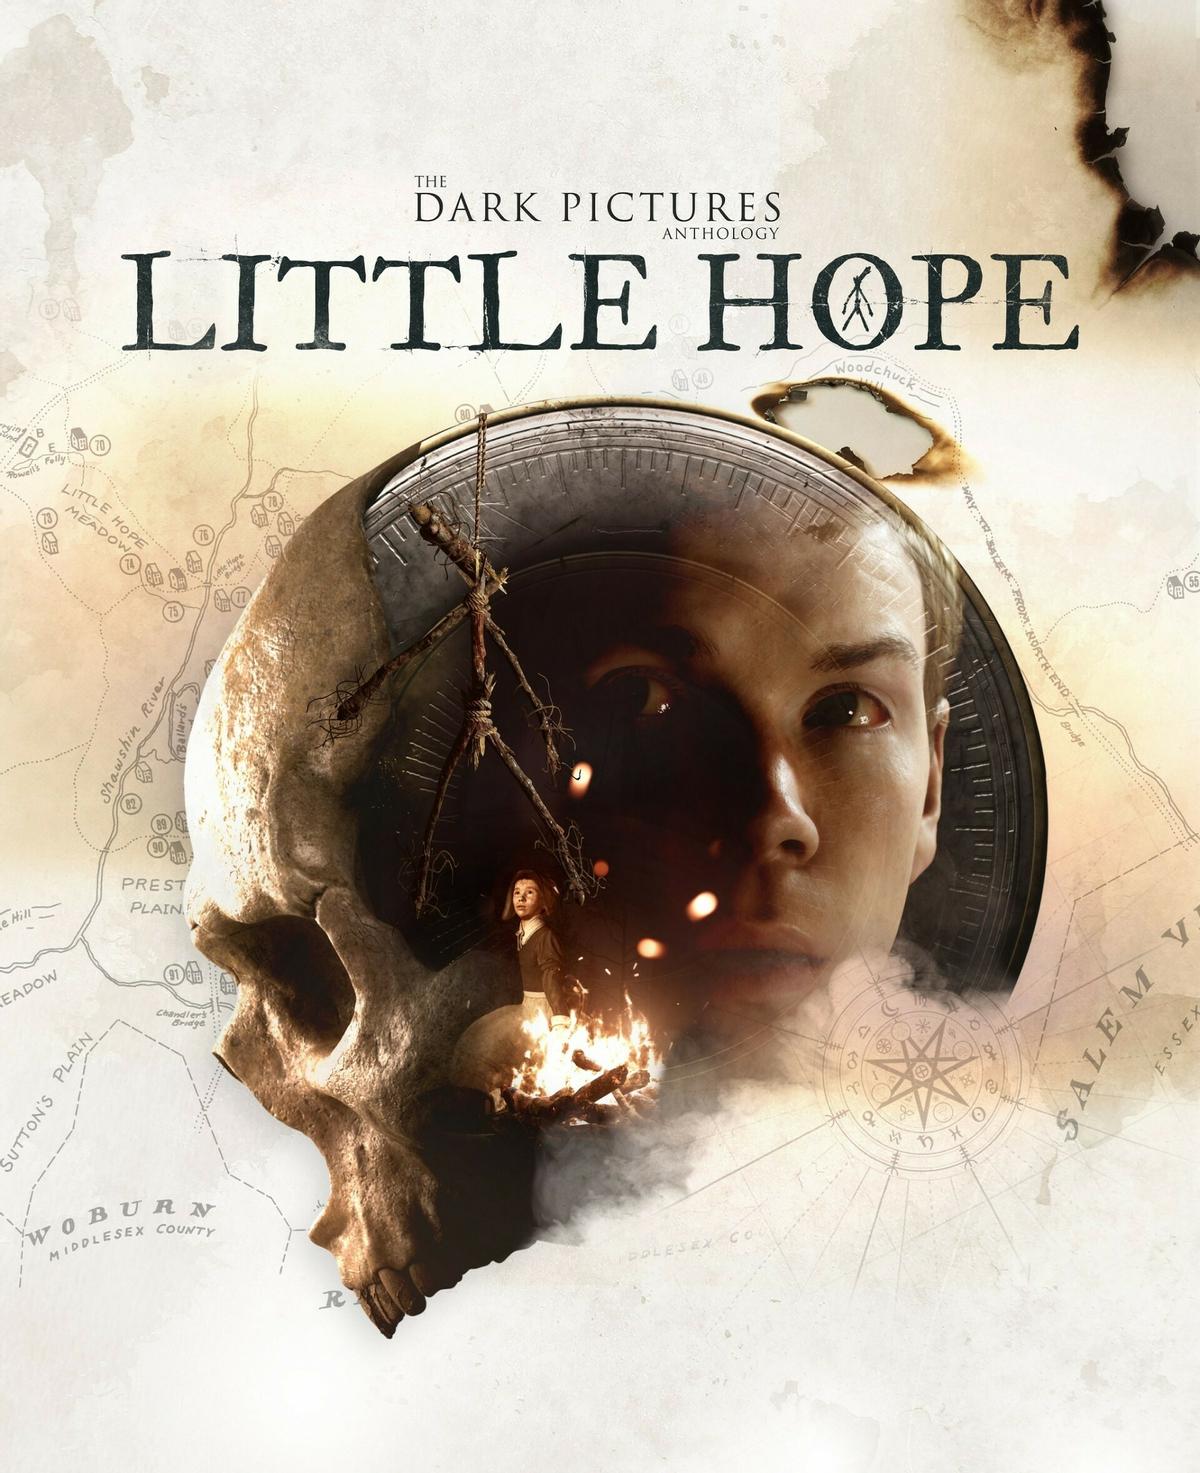 The Dark Pictures: Little Hope — Тизер-трейлер новой части хоррор-антологии